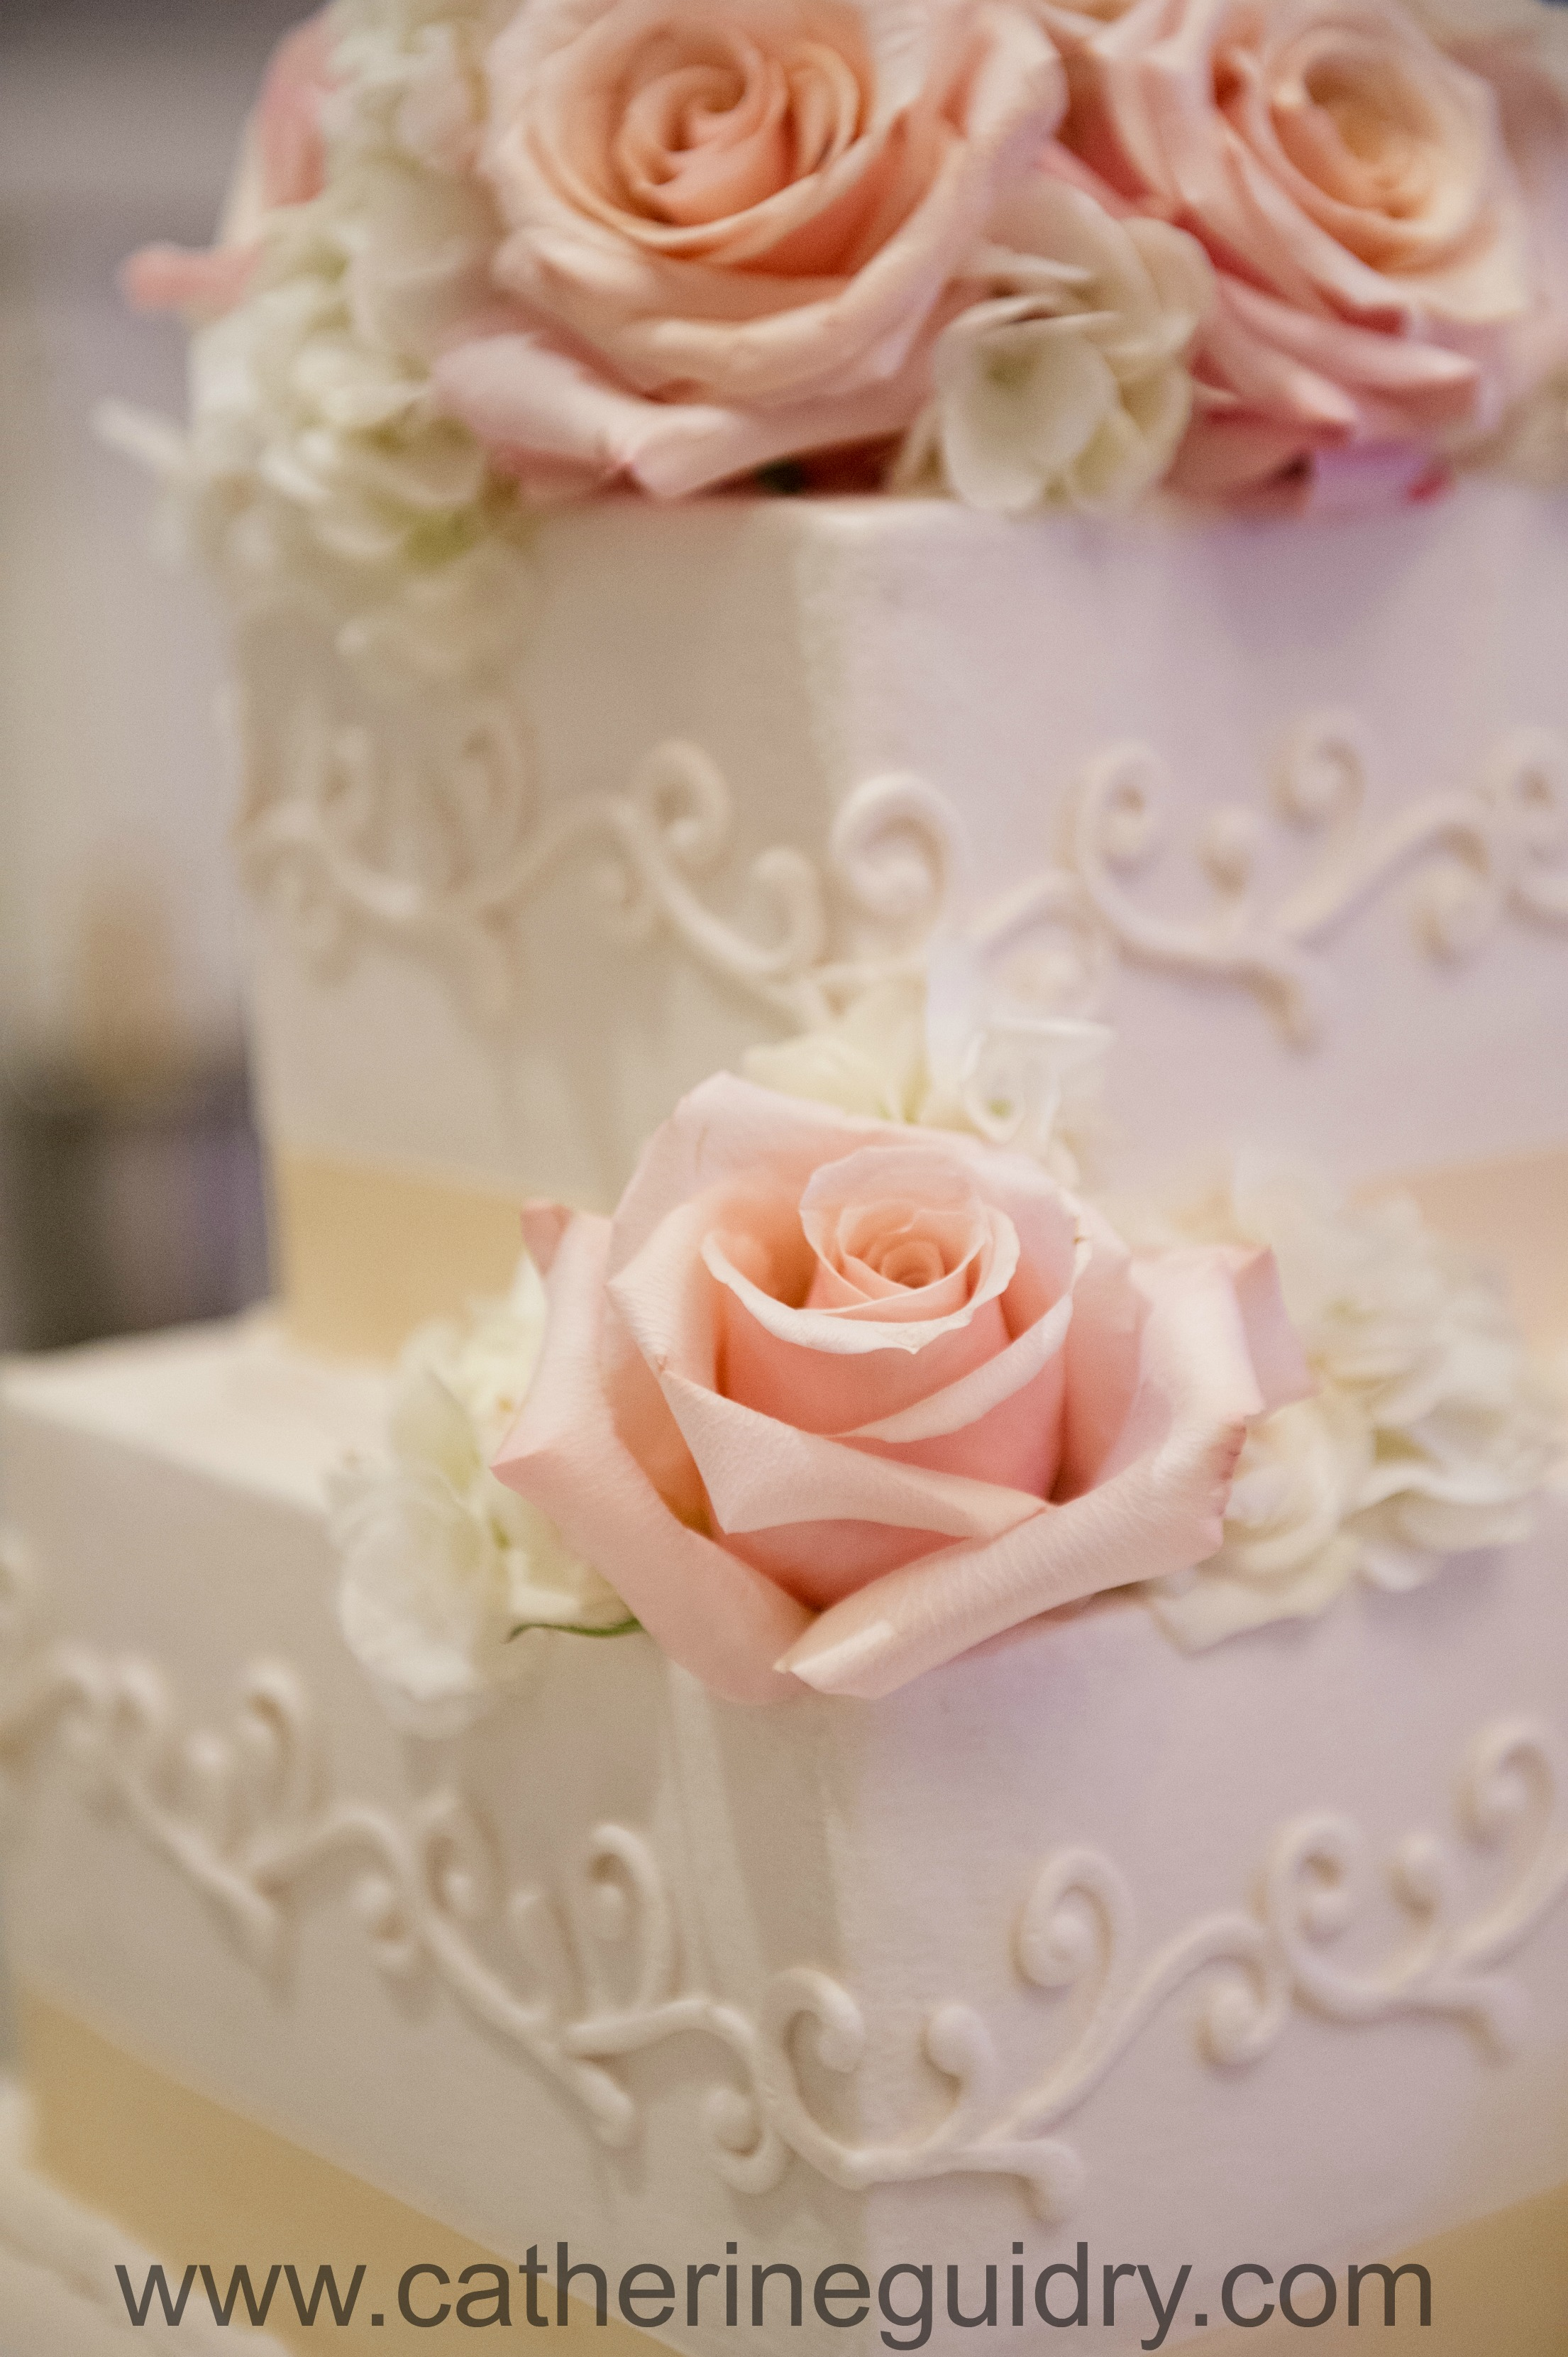 530-JENNIFER_TREY_WEDDING.jpg